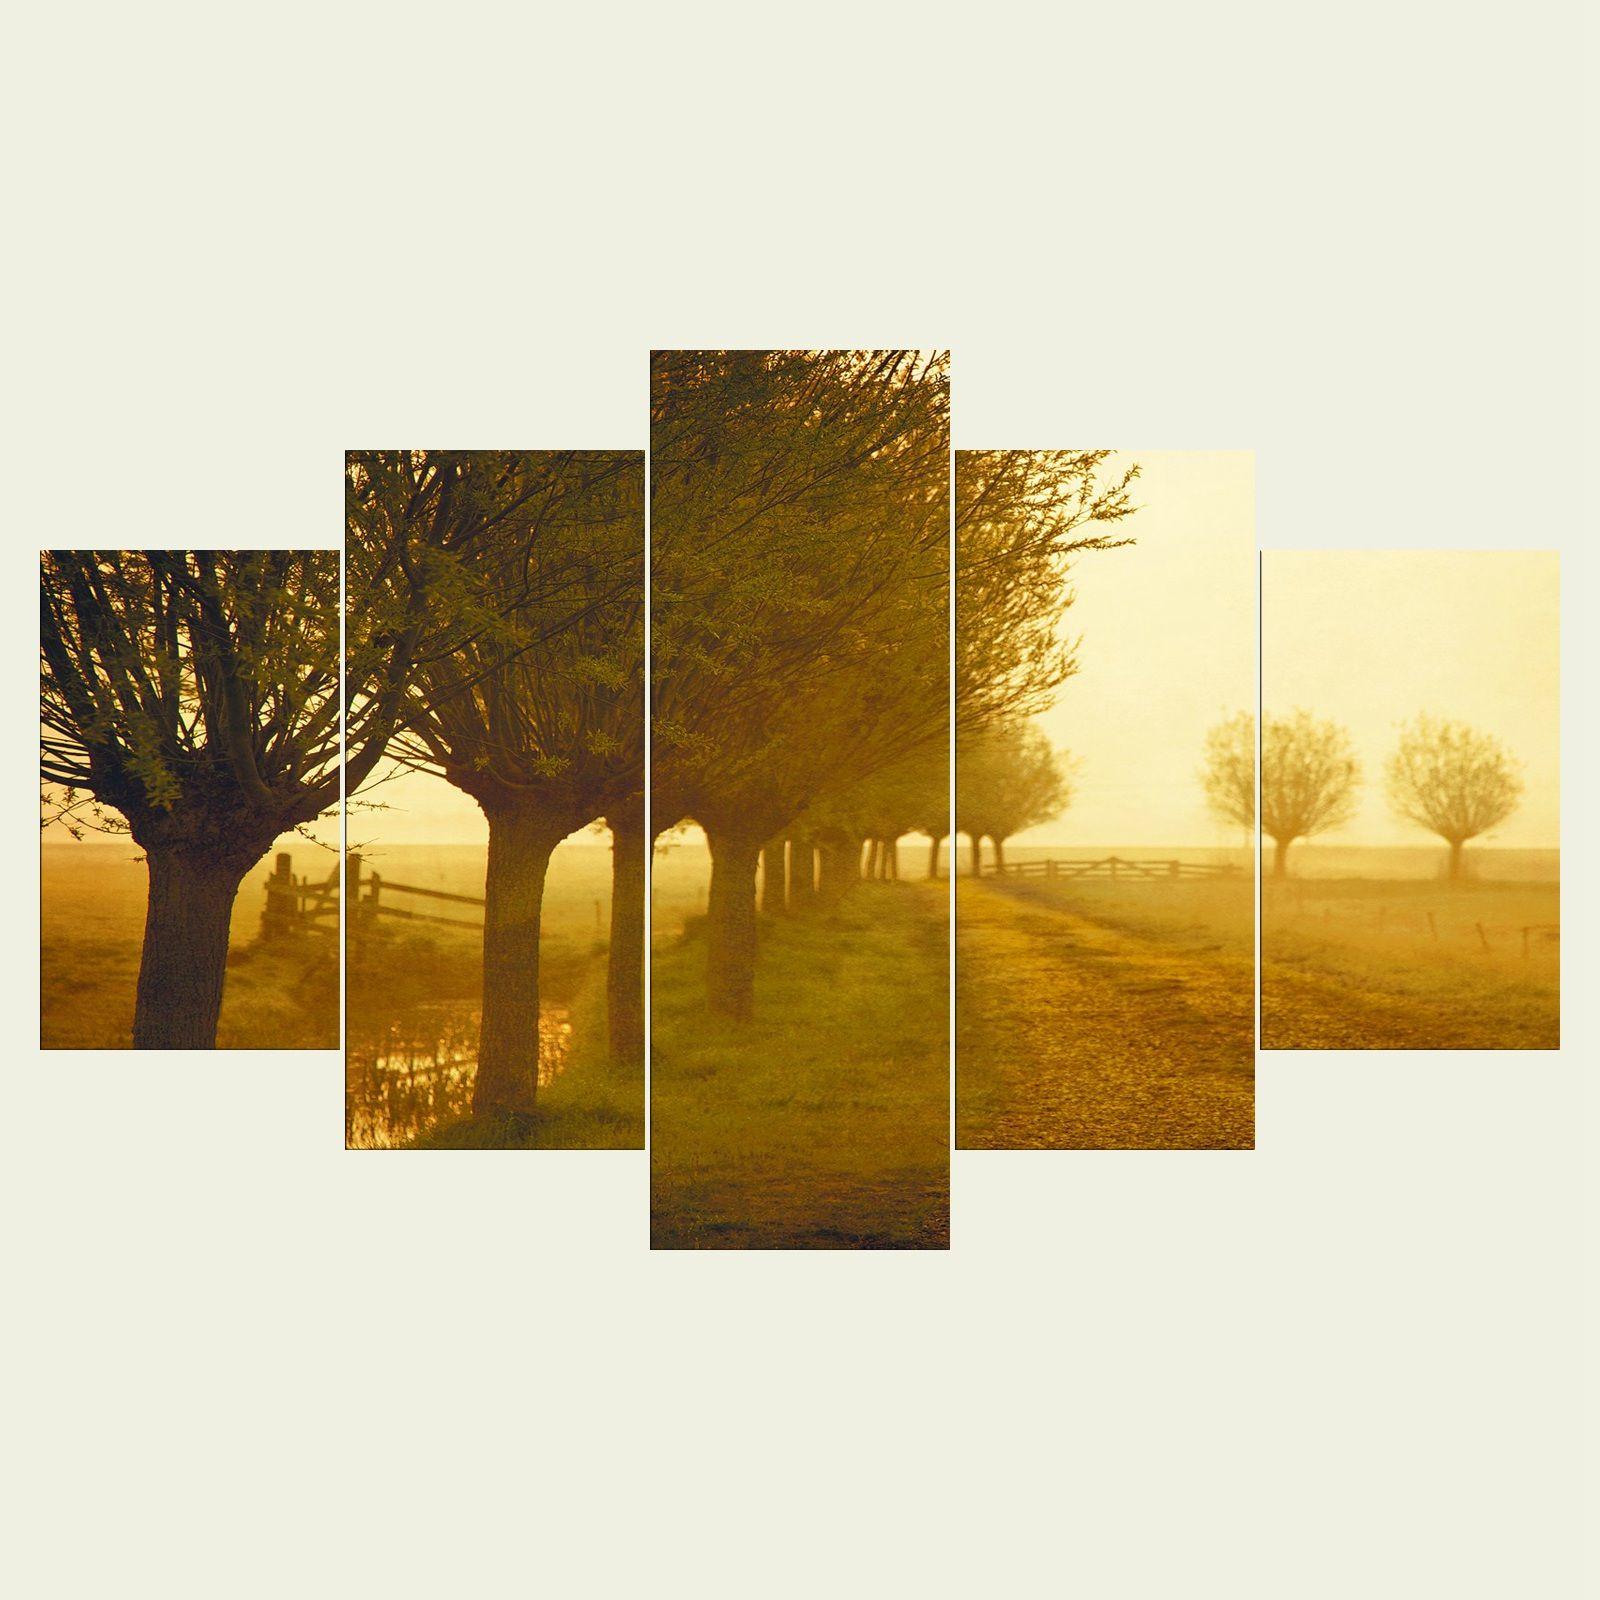 2018 No Frame The Trees Three Series Hd Canvas Print 5 Panel Wall ...